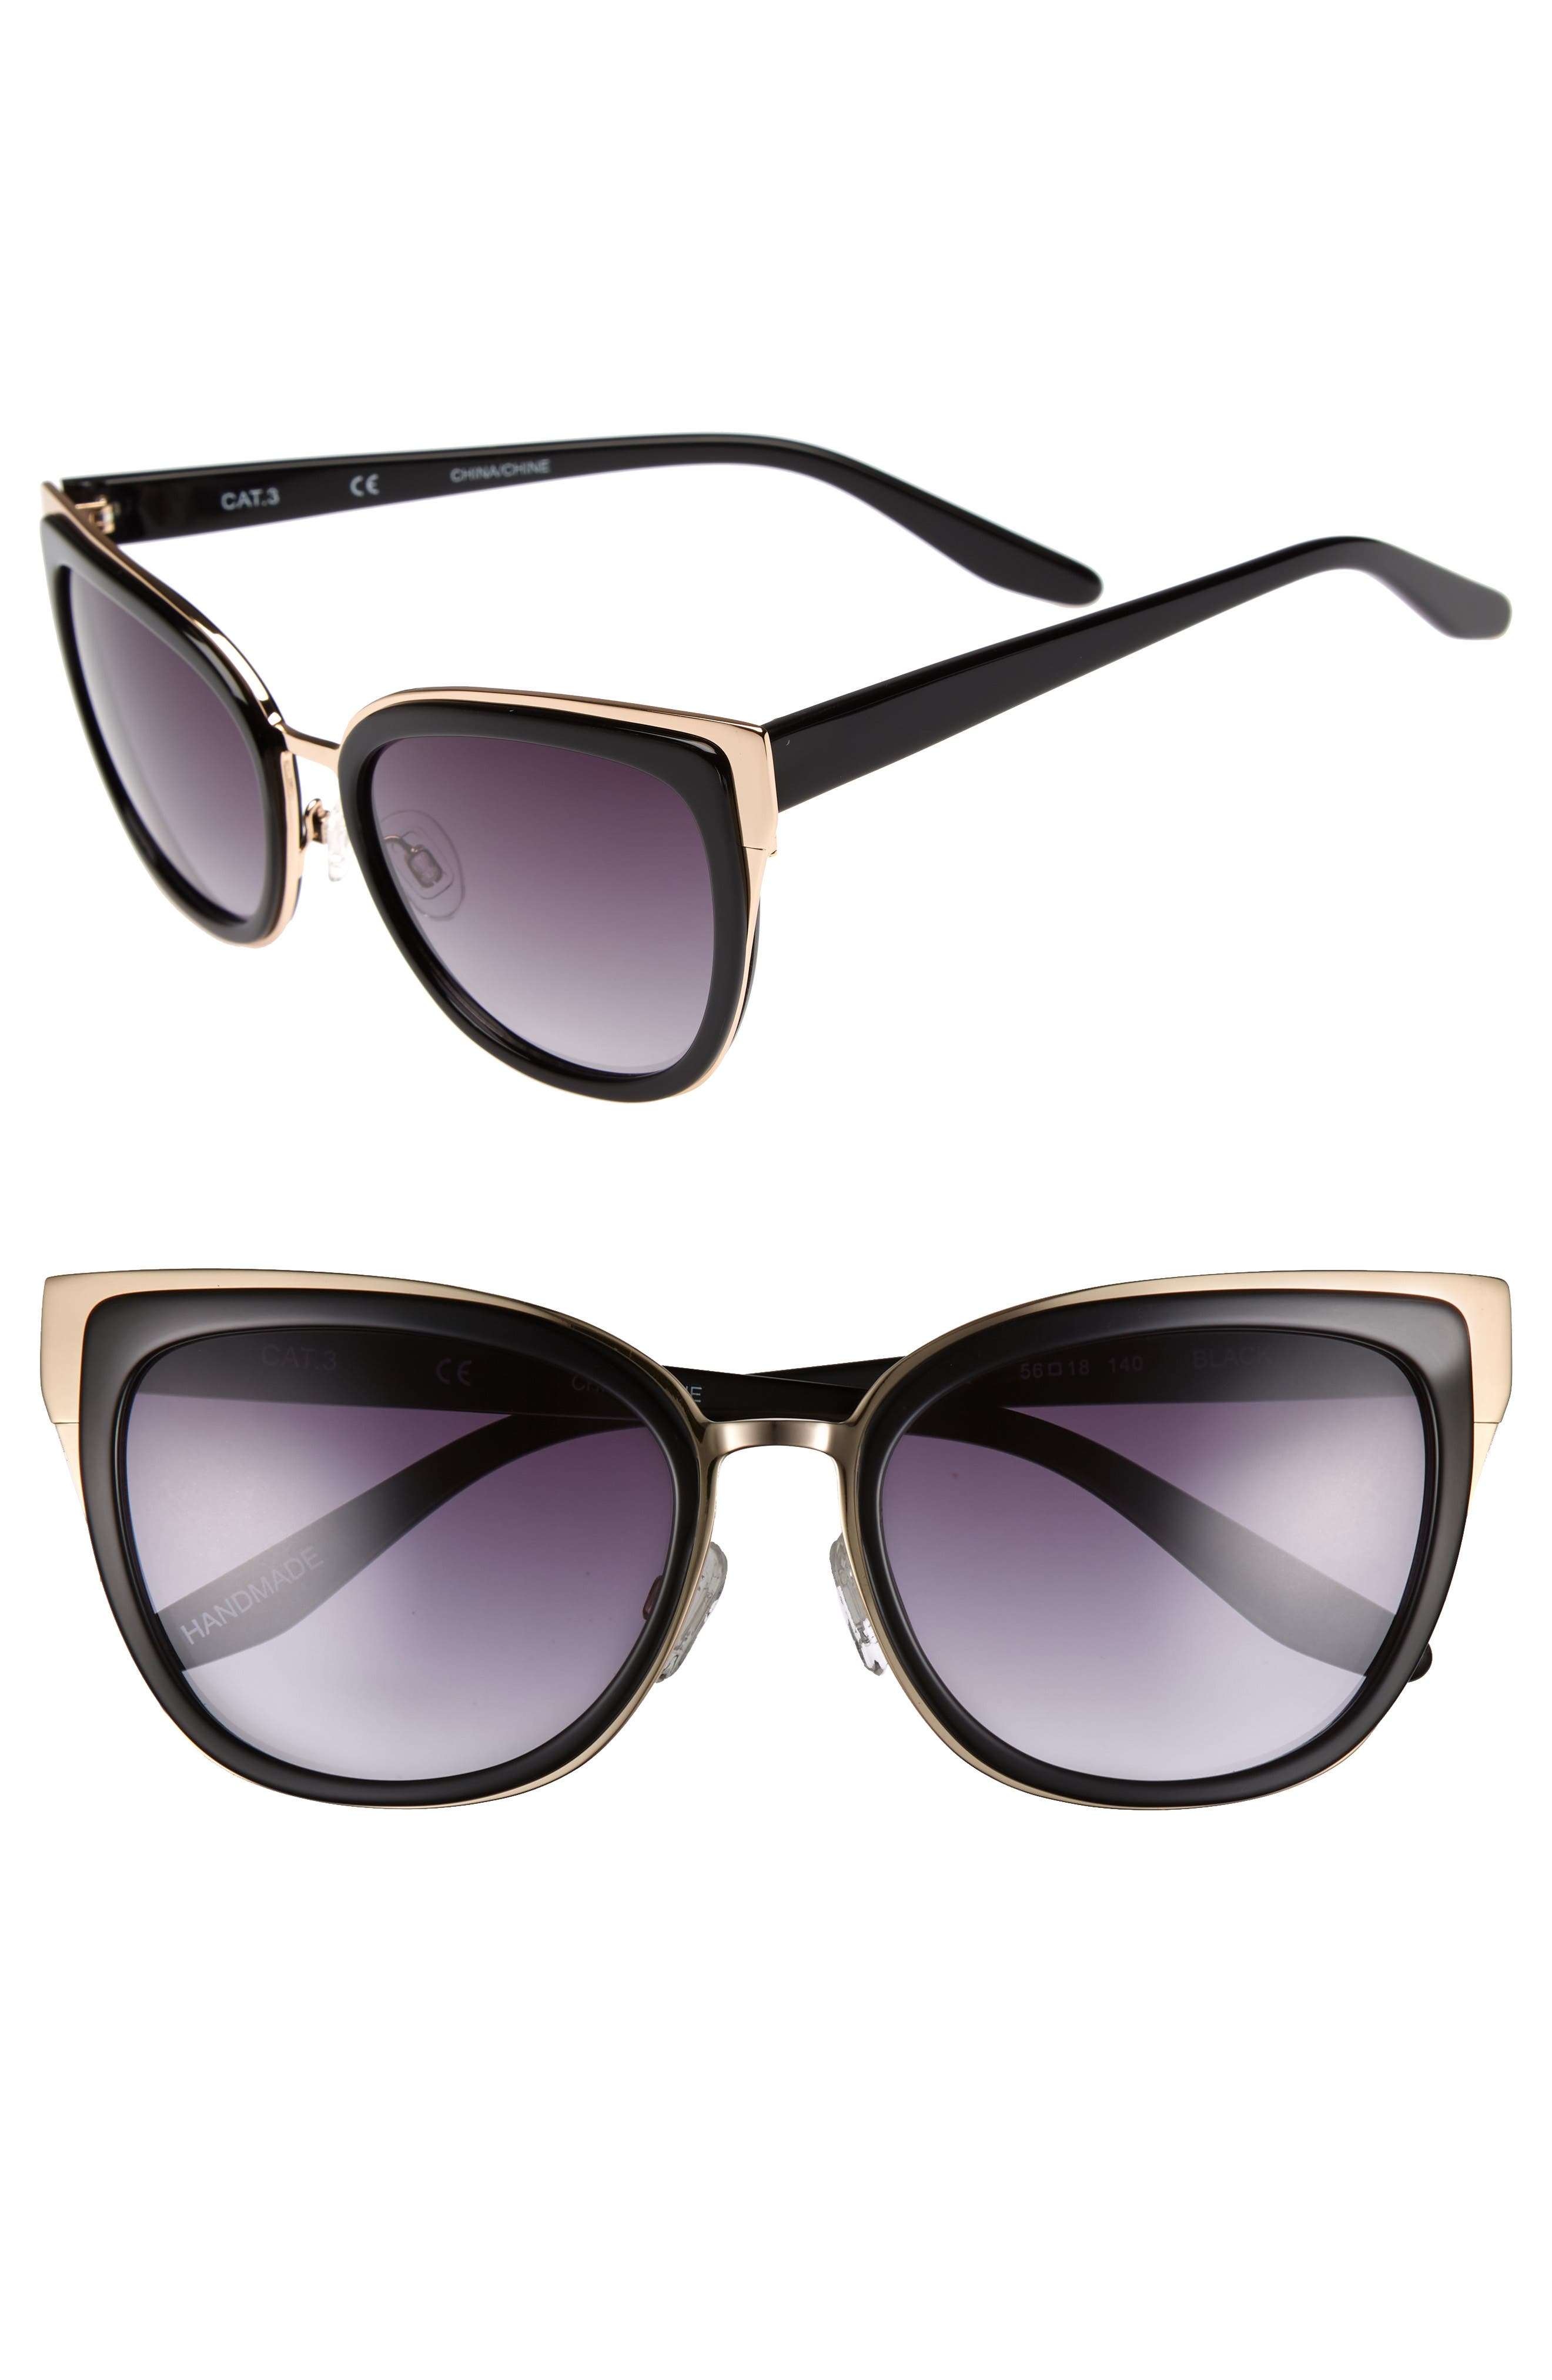 Lillian 56mm Sunglasses,                             Main thumbnail 1, color,                             001